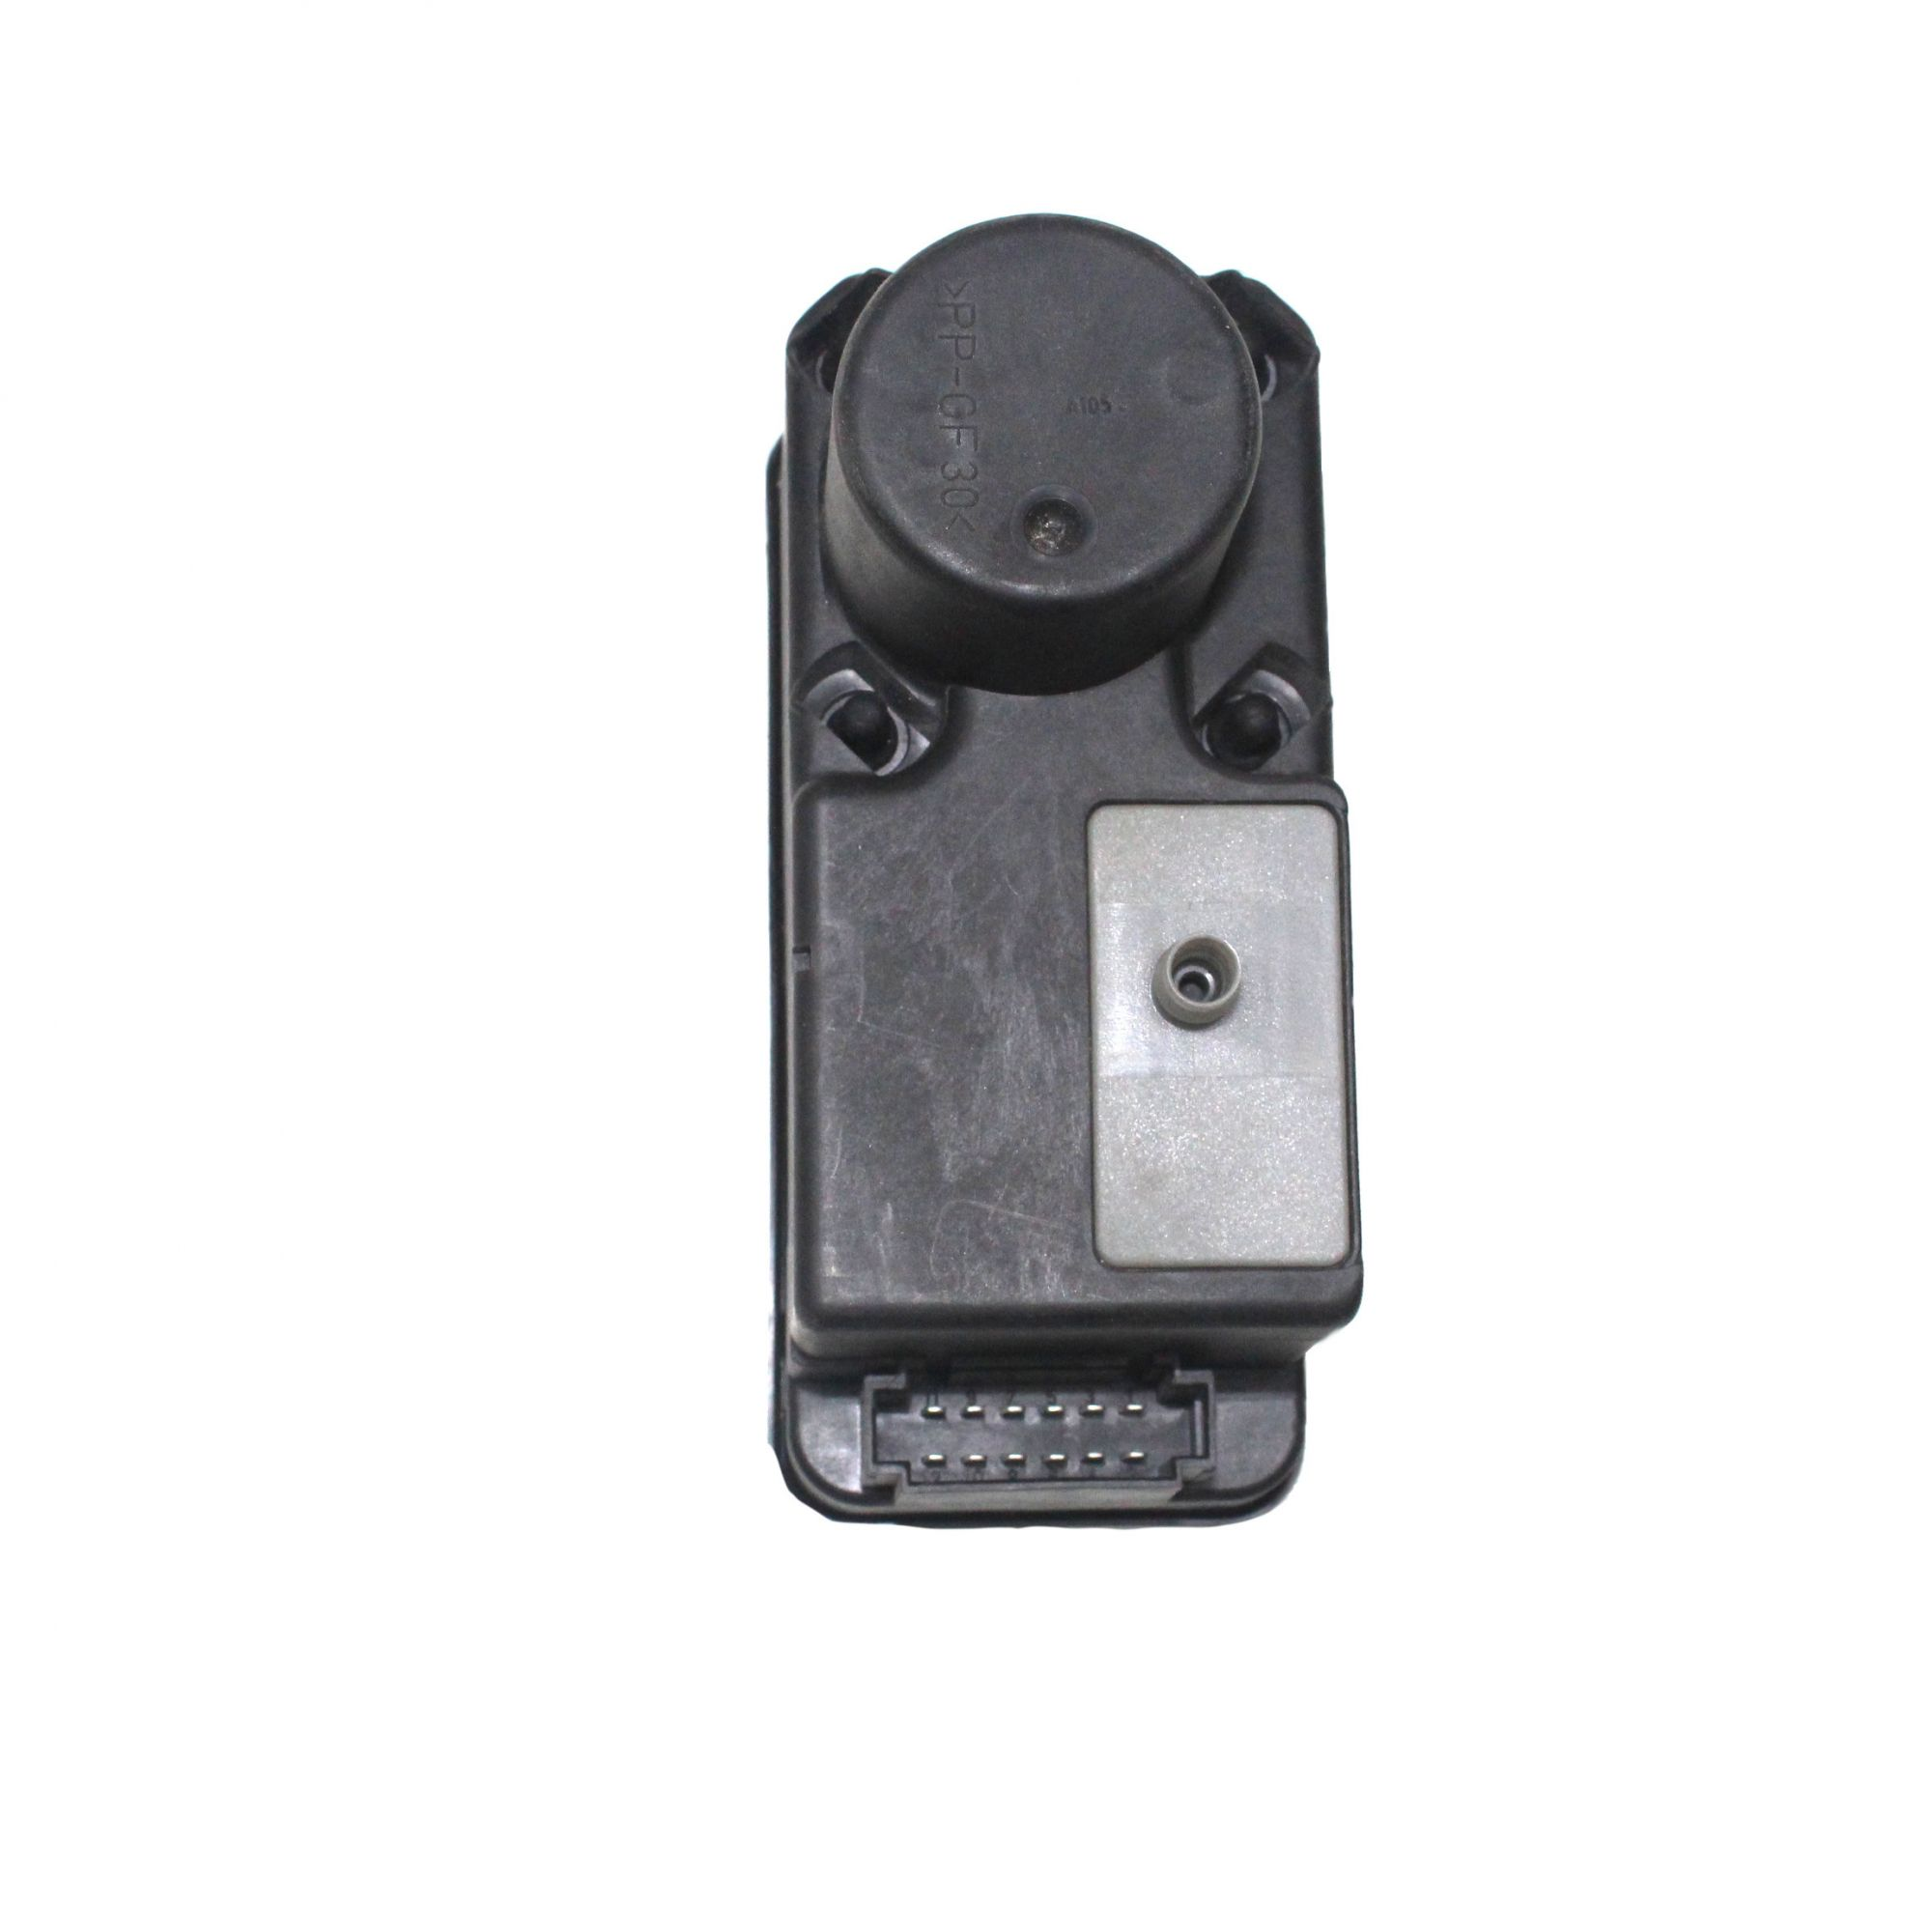 Bomba Vácuo Trava Portas Vw Golf Mk3 1994 -1998 1H0962257E